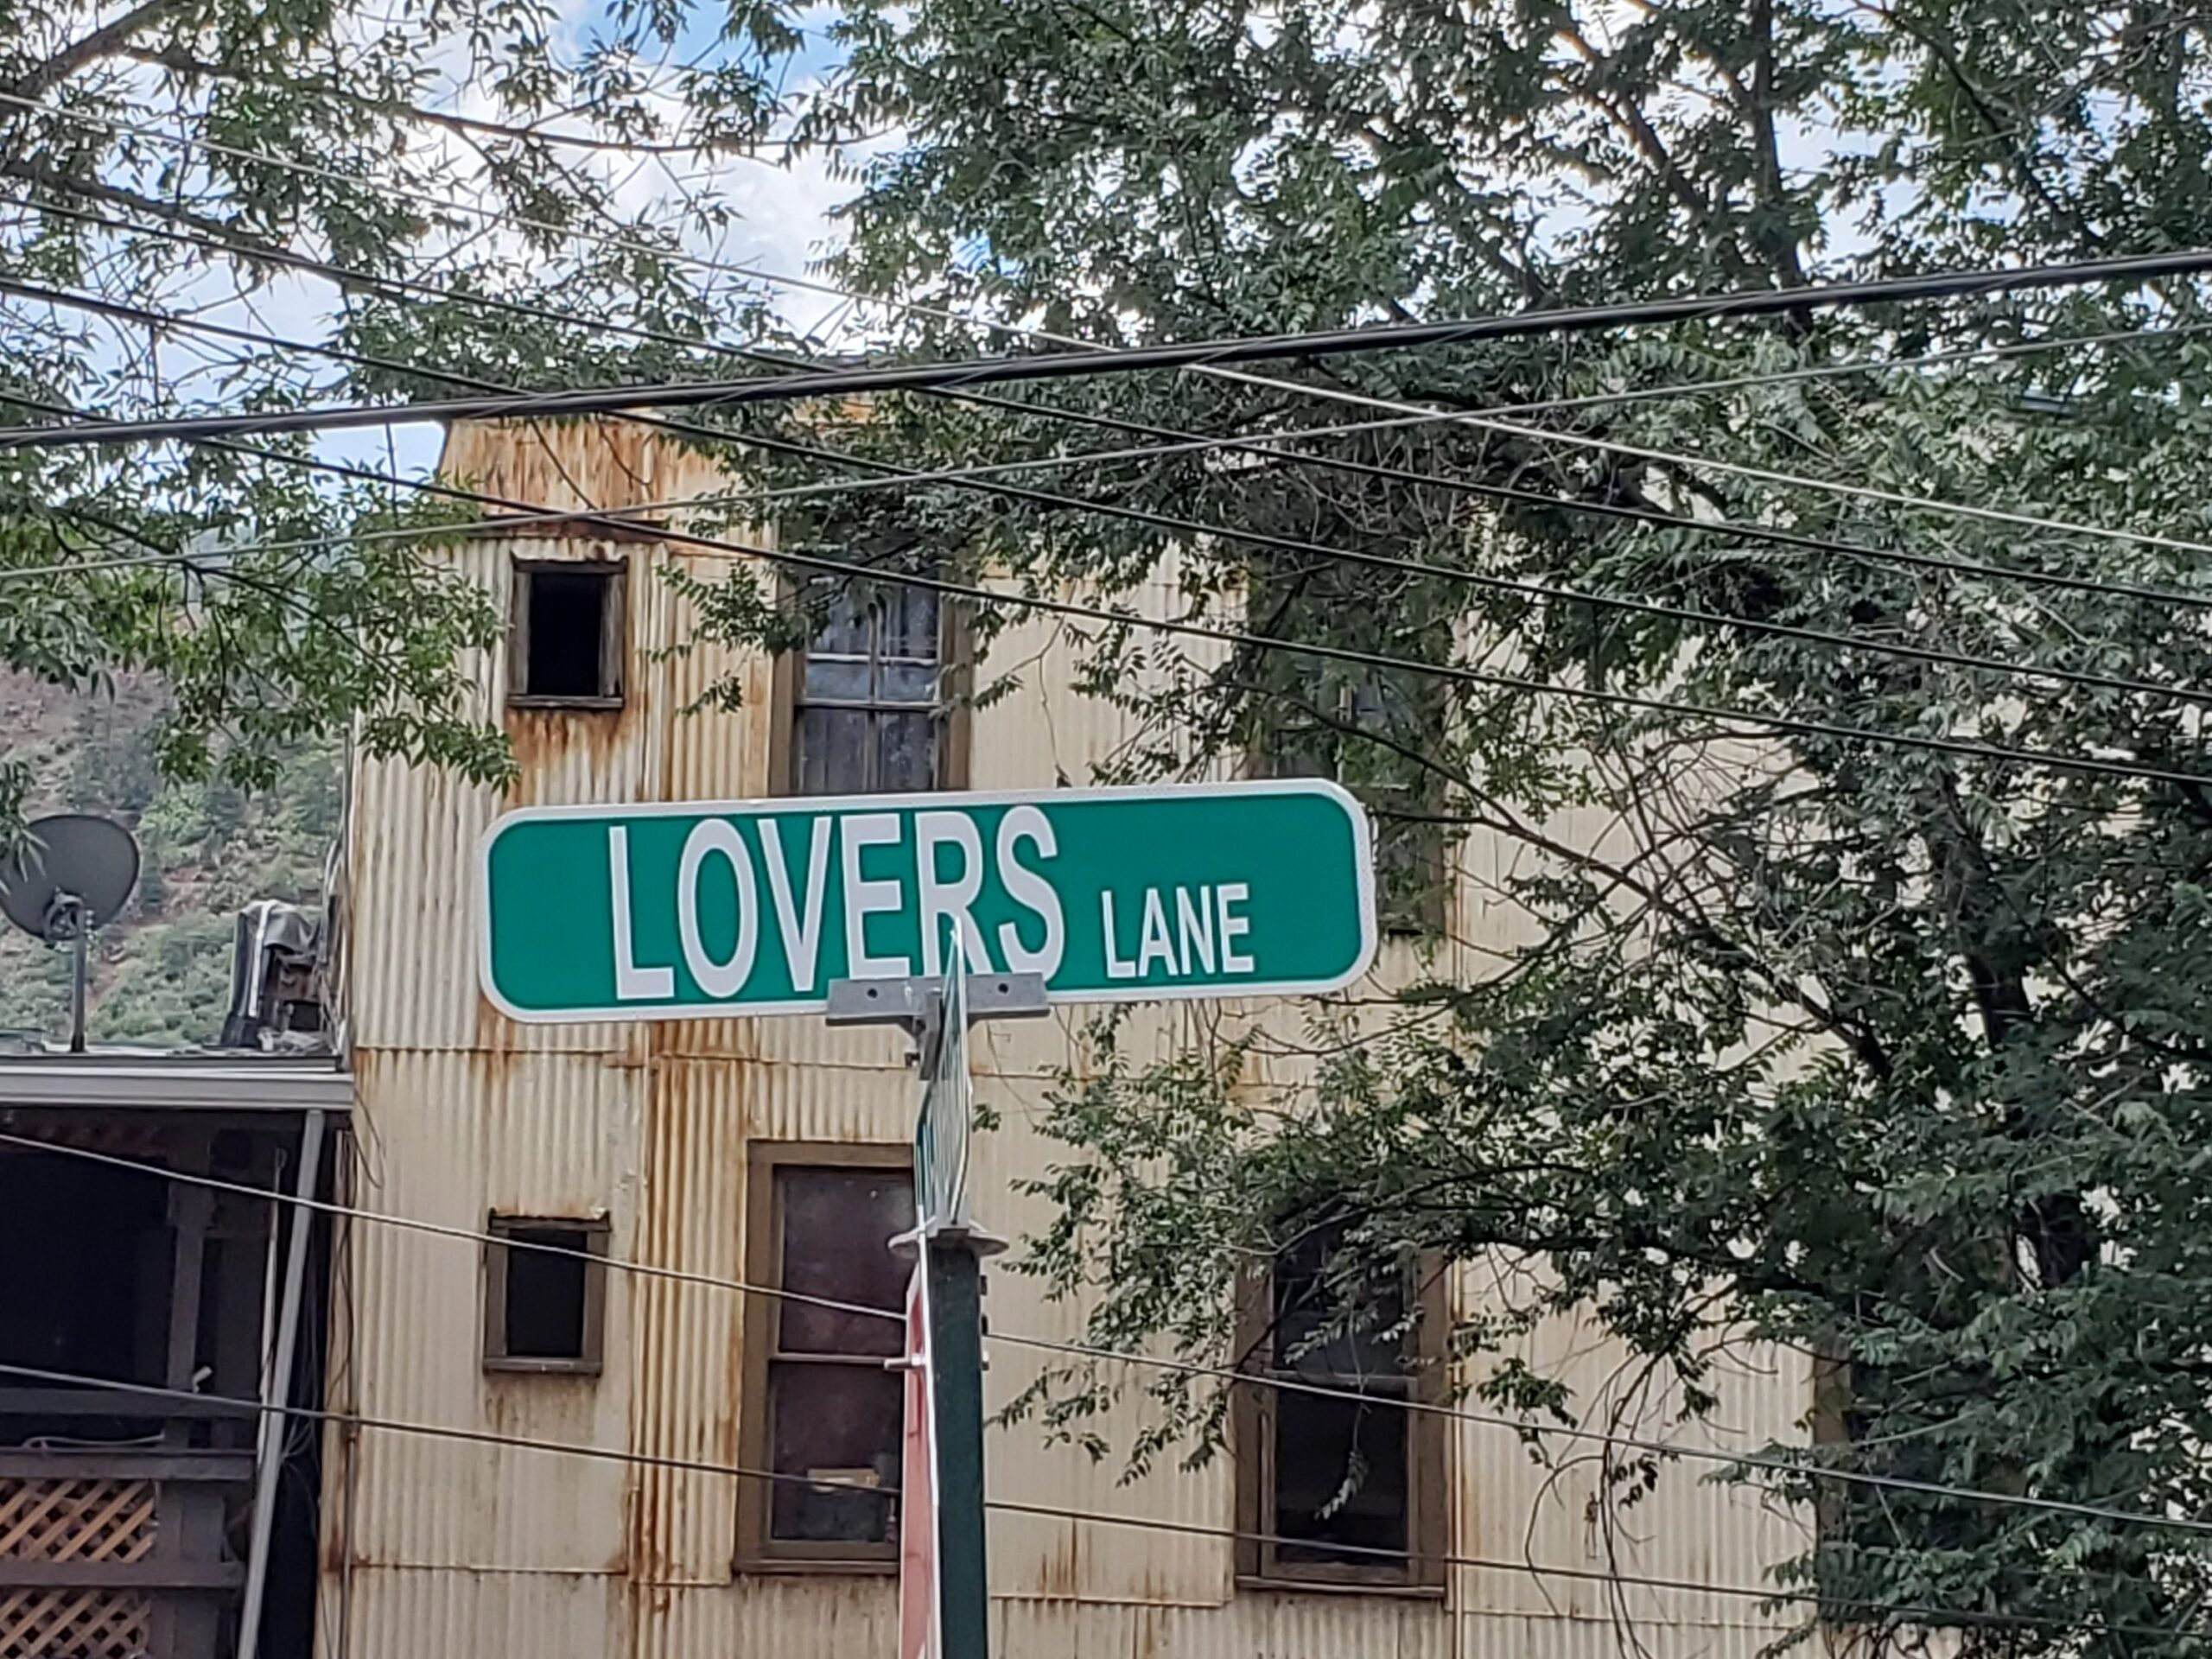 Lovers Lane Street Sign